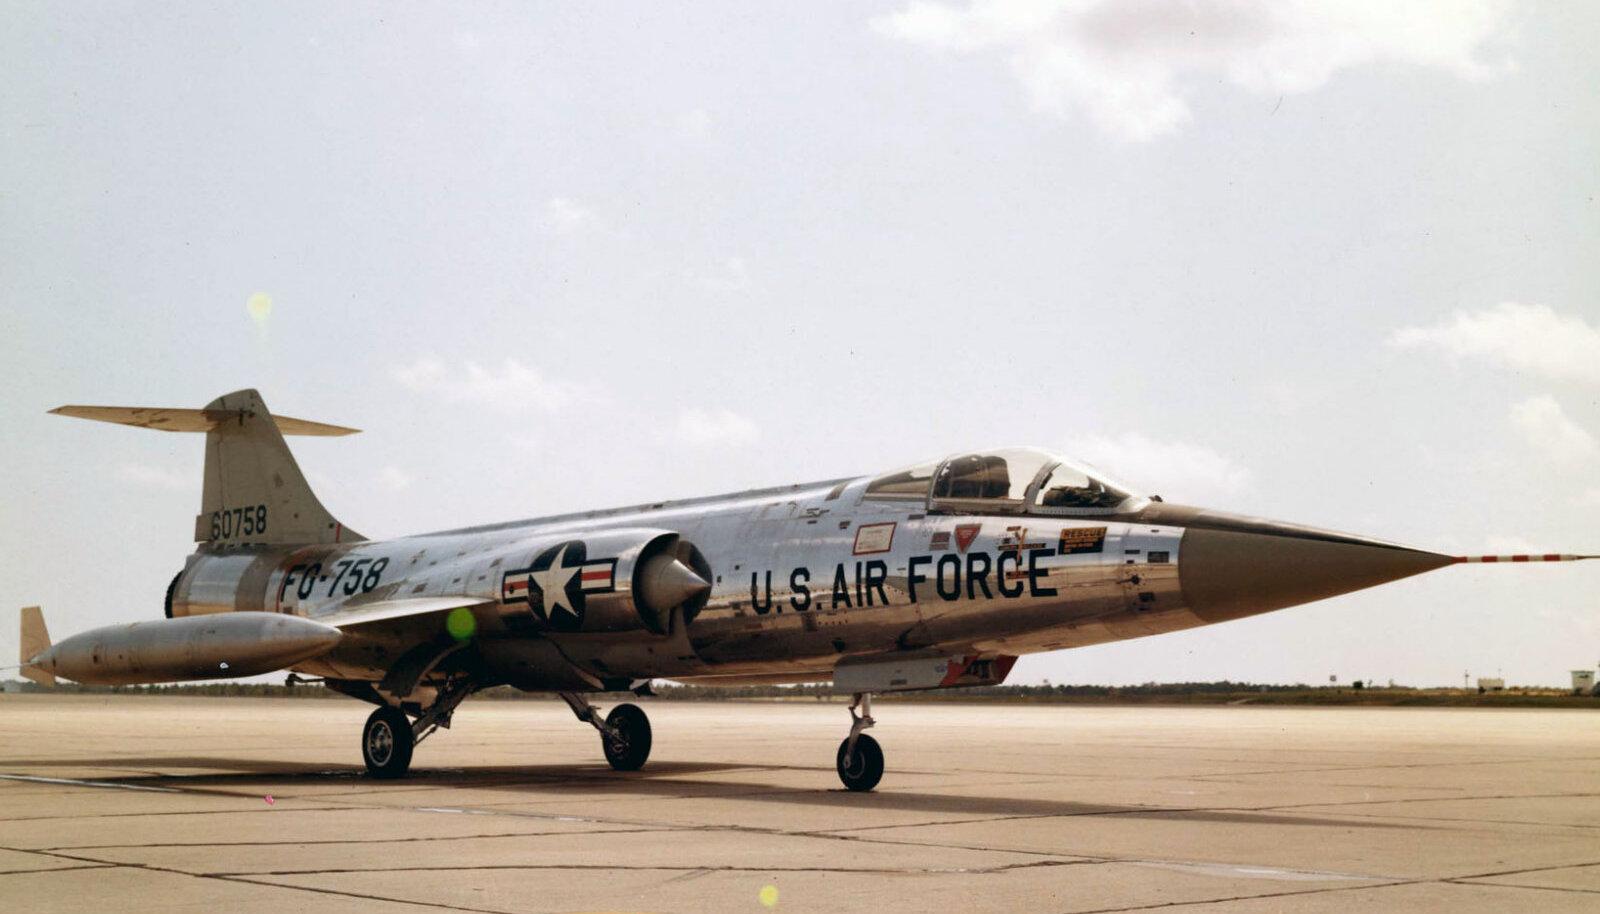 Lockheed F-104A-10-LO (SN 56-0758) (Foto: Wikipedia / USA õhujõud)